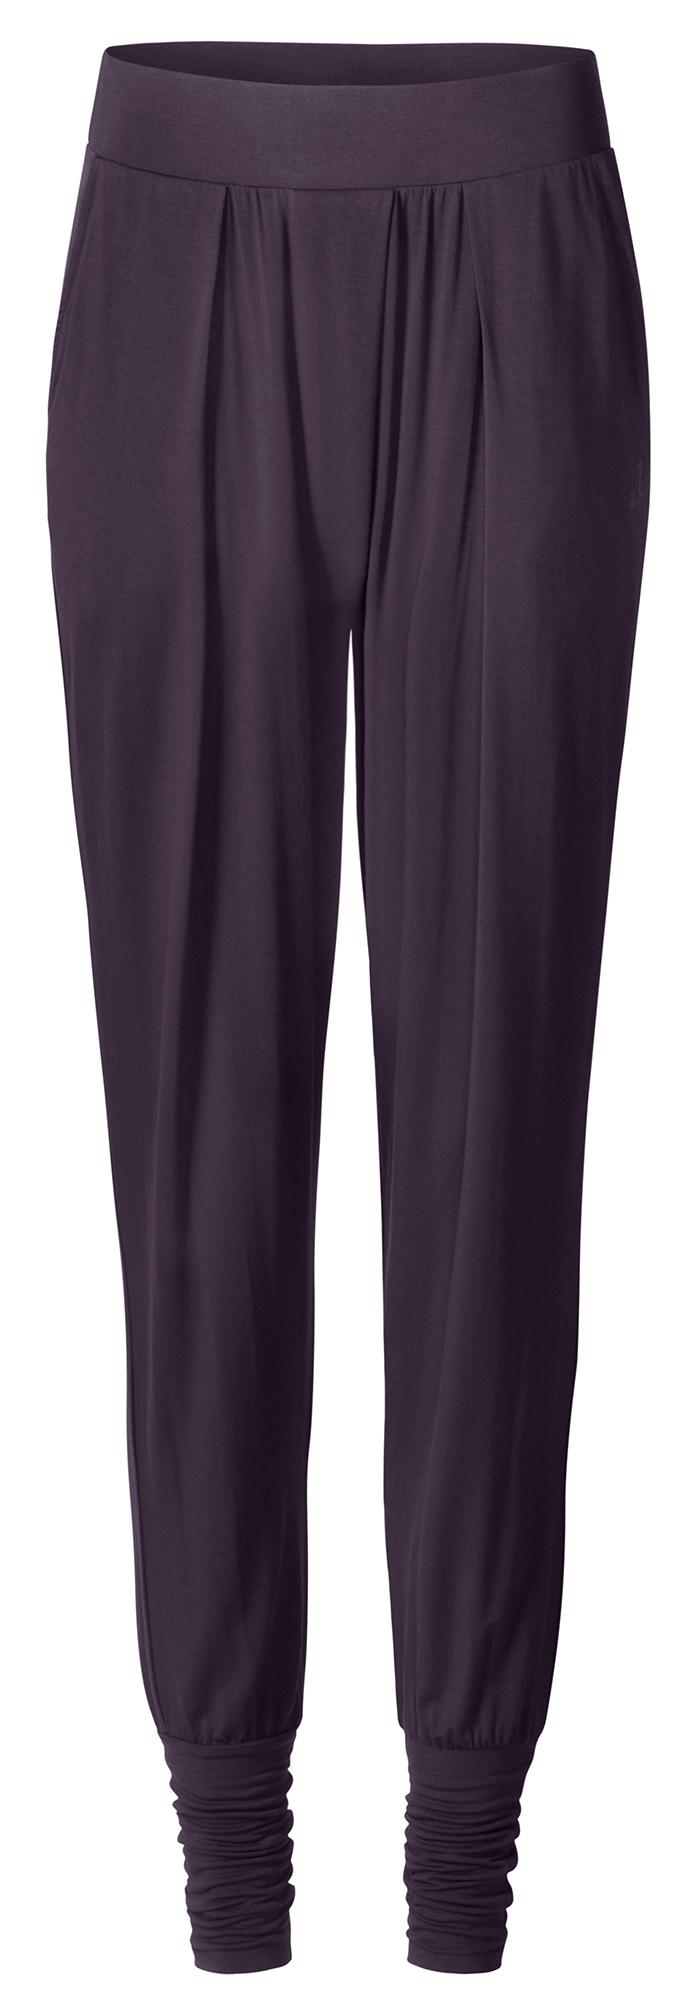 "Yoga-Wide-Pants ""Cuff"" - dark aubergine"